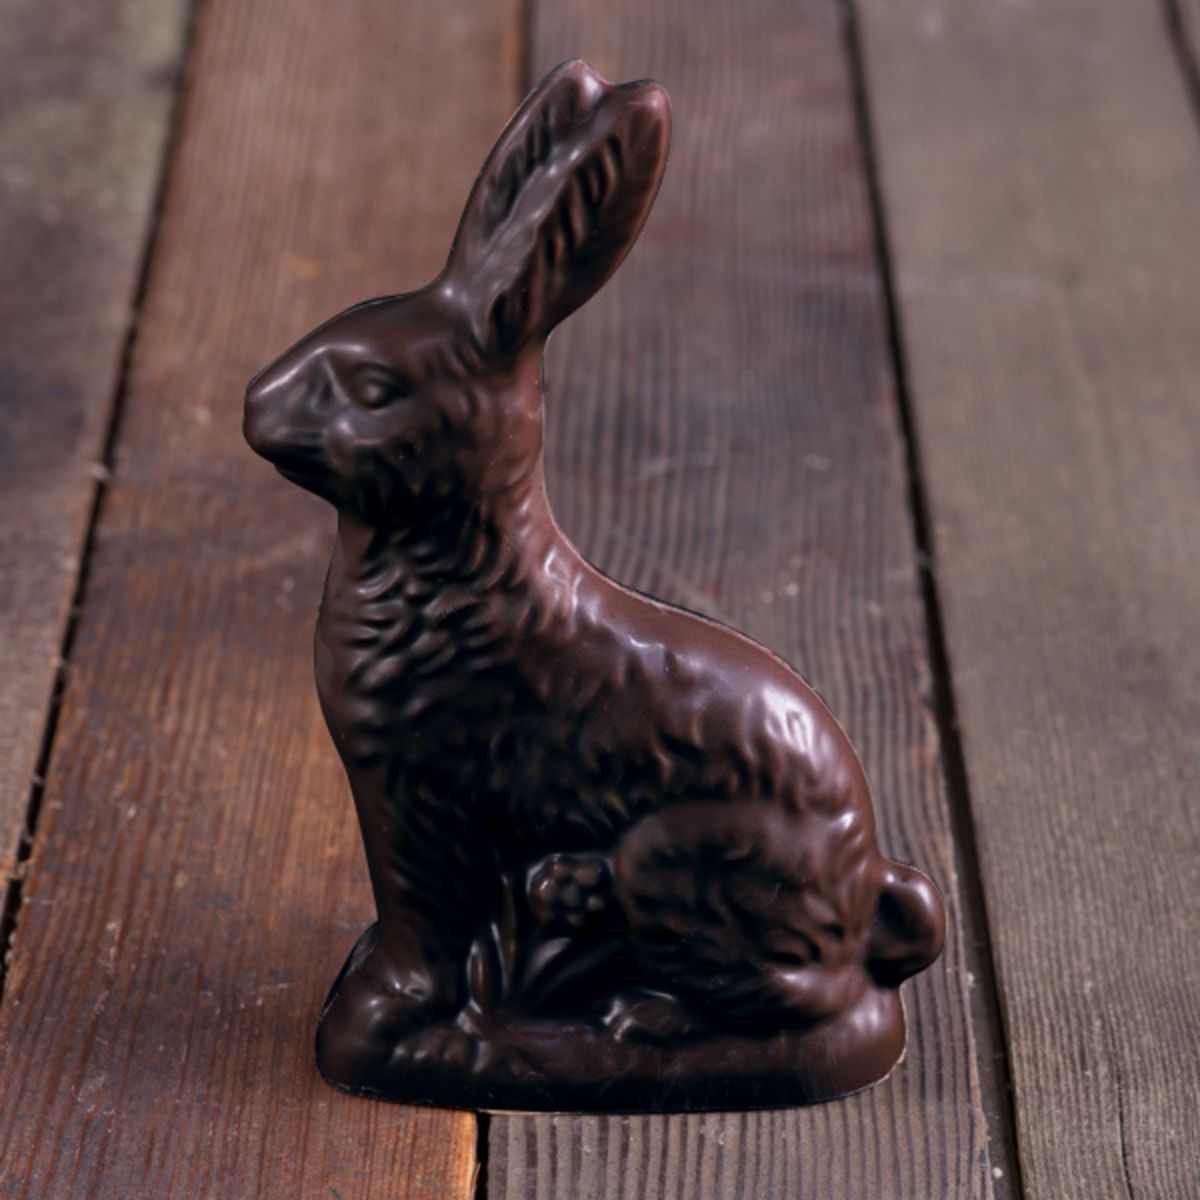 Small Dark Chocolate Bunny (Sitting)